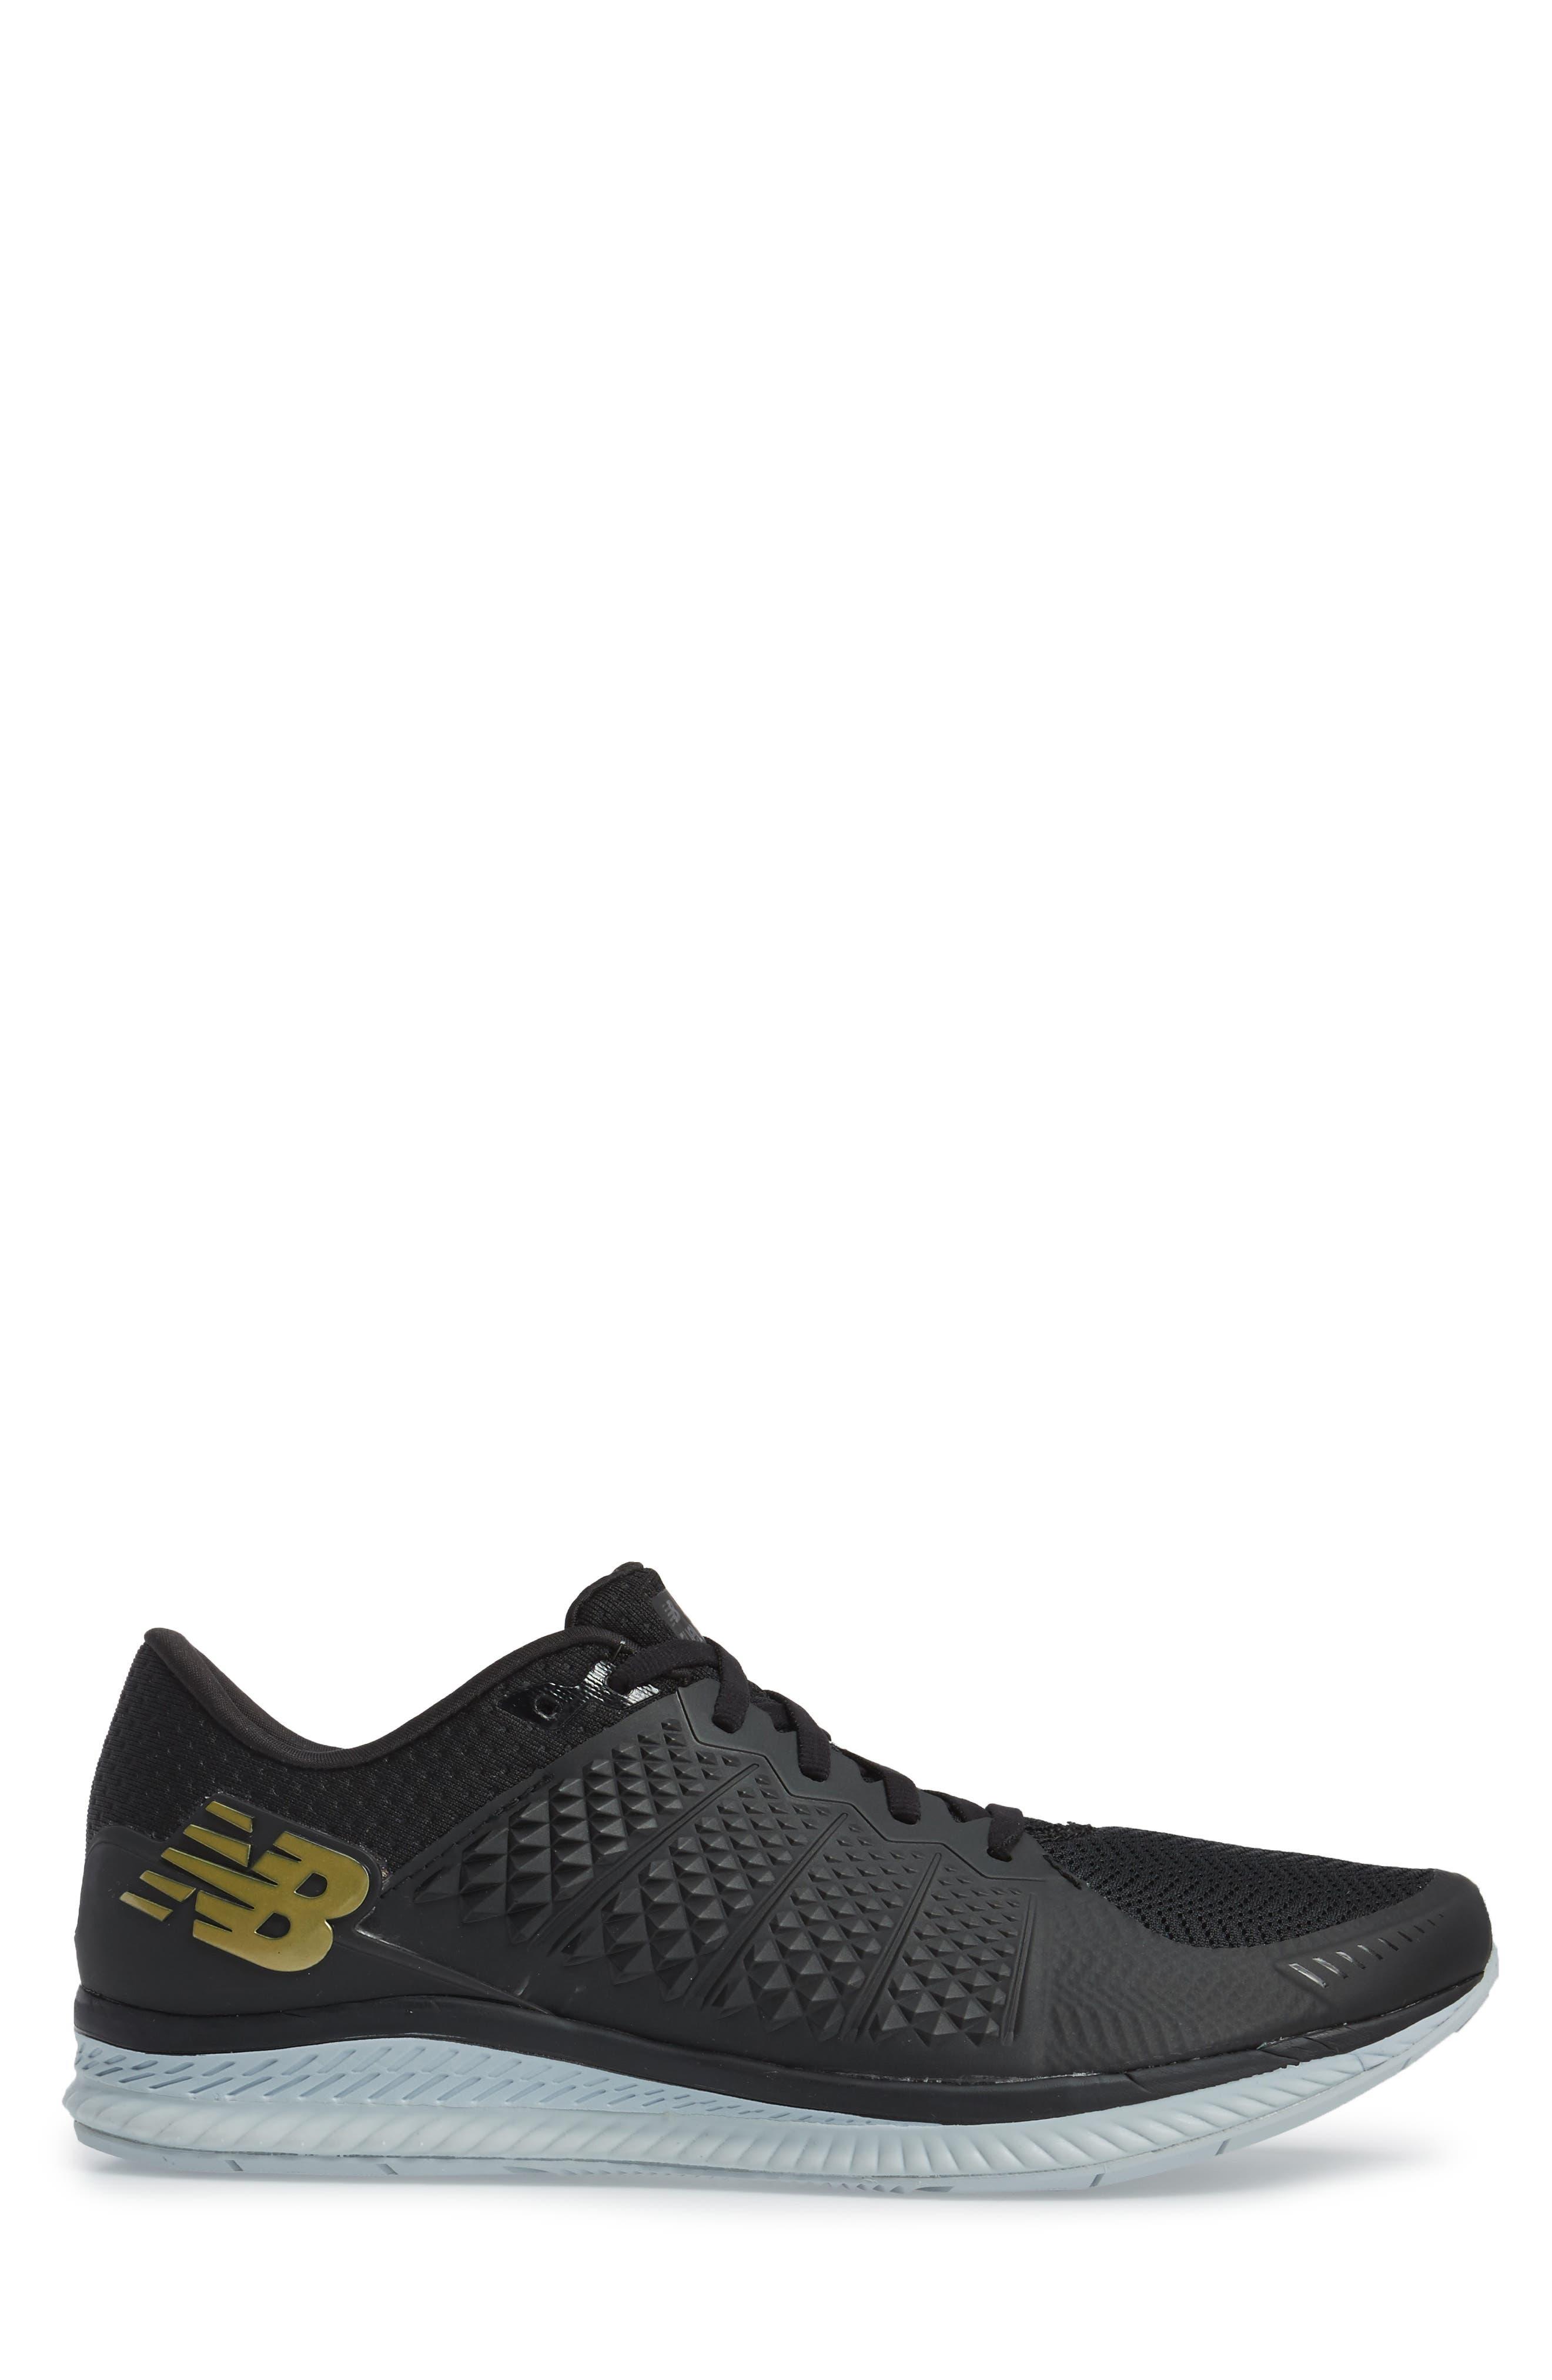 Alternate Image 3  - New Balance Vazee Fuel Cell Running Shoe (Men)